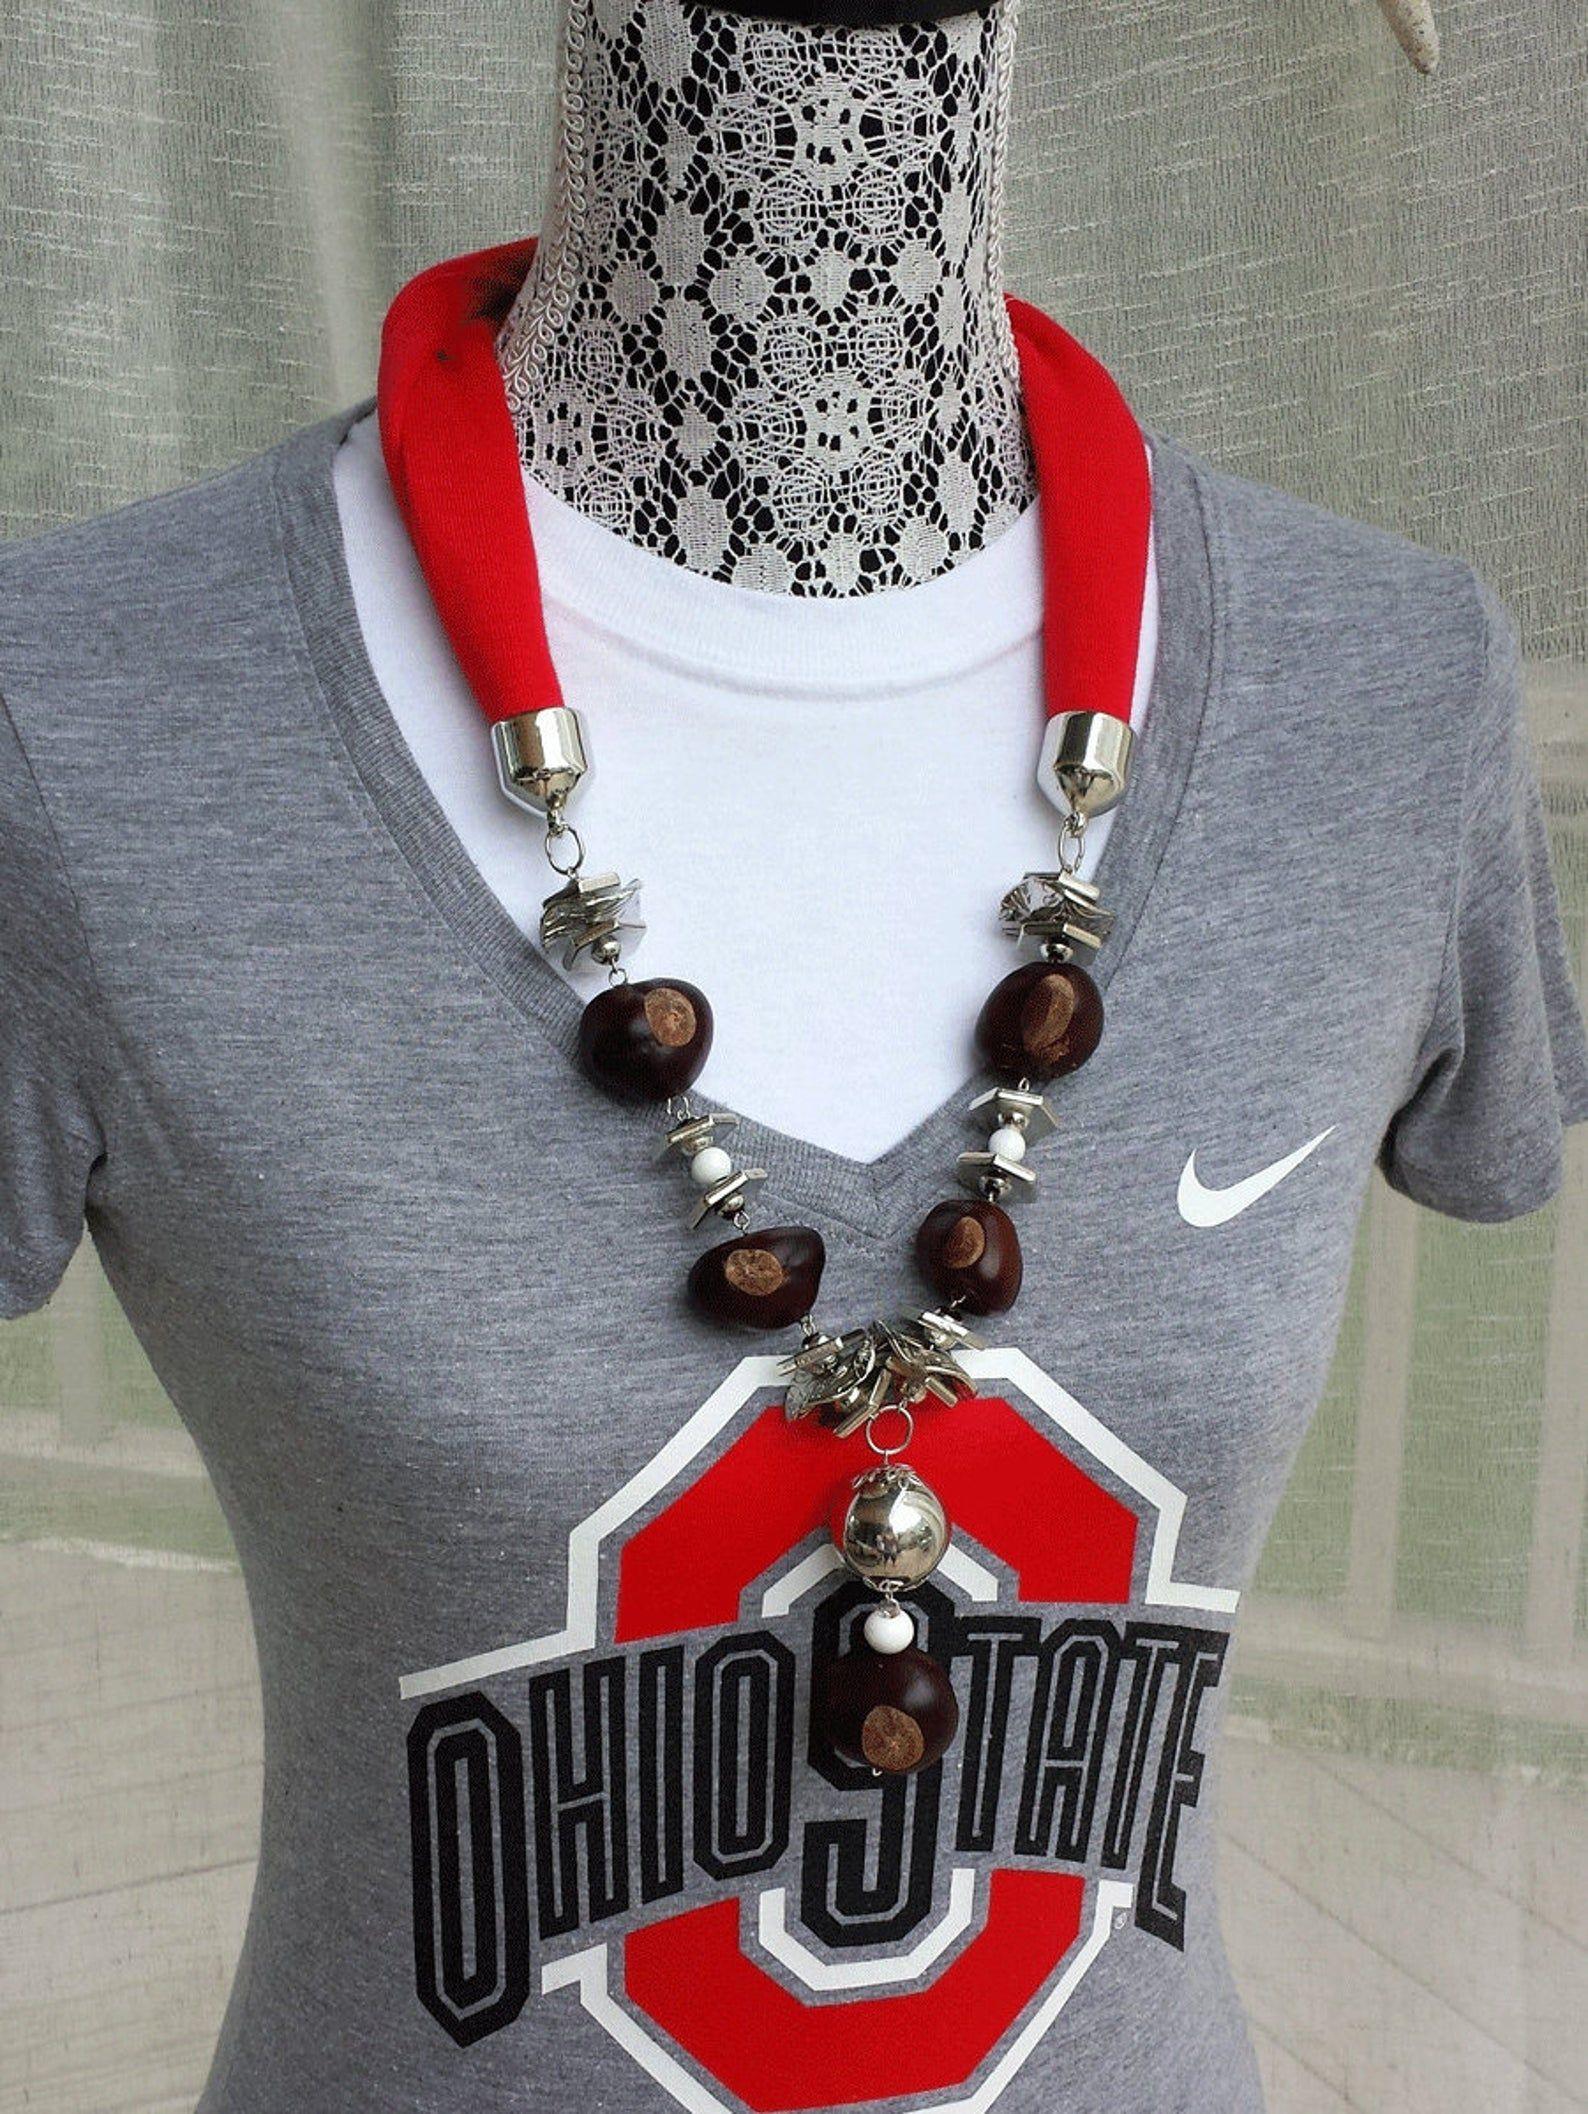 Ohio State Buckeye Jersey Necklace #ohiostatebuckeyes Ohio State Buckeye Jersey Necklace image 0 #ohiostatebuckeyes